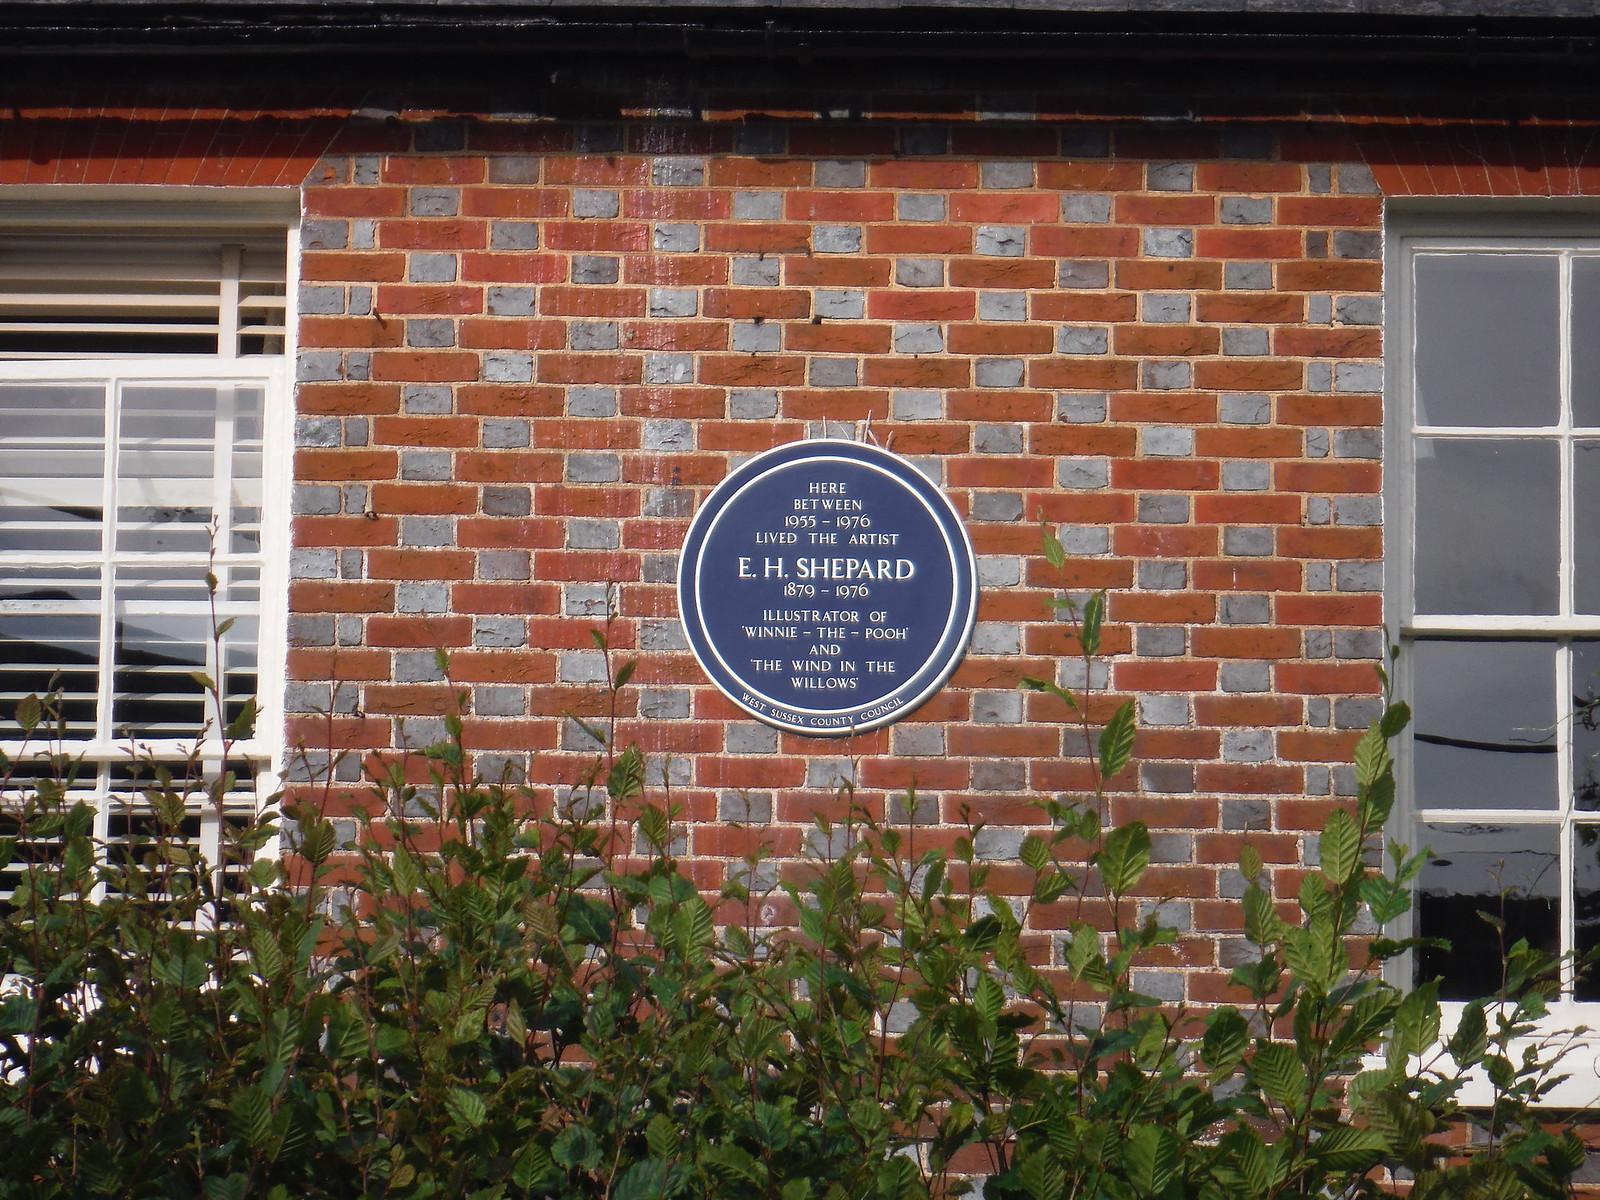 House where E.H. Shepard lived, Lodsworth SWC Walk 217 Midhurst Way: Arundel to Midhurst